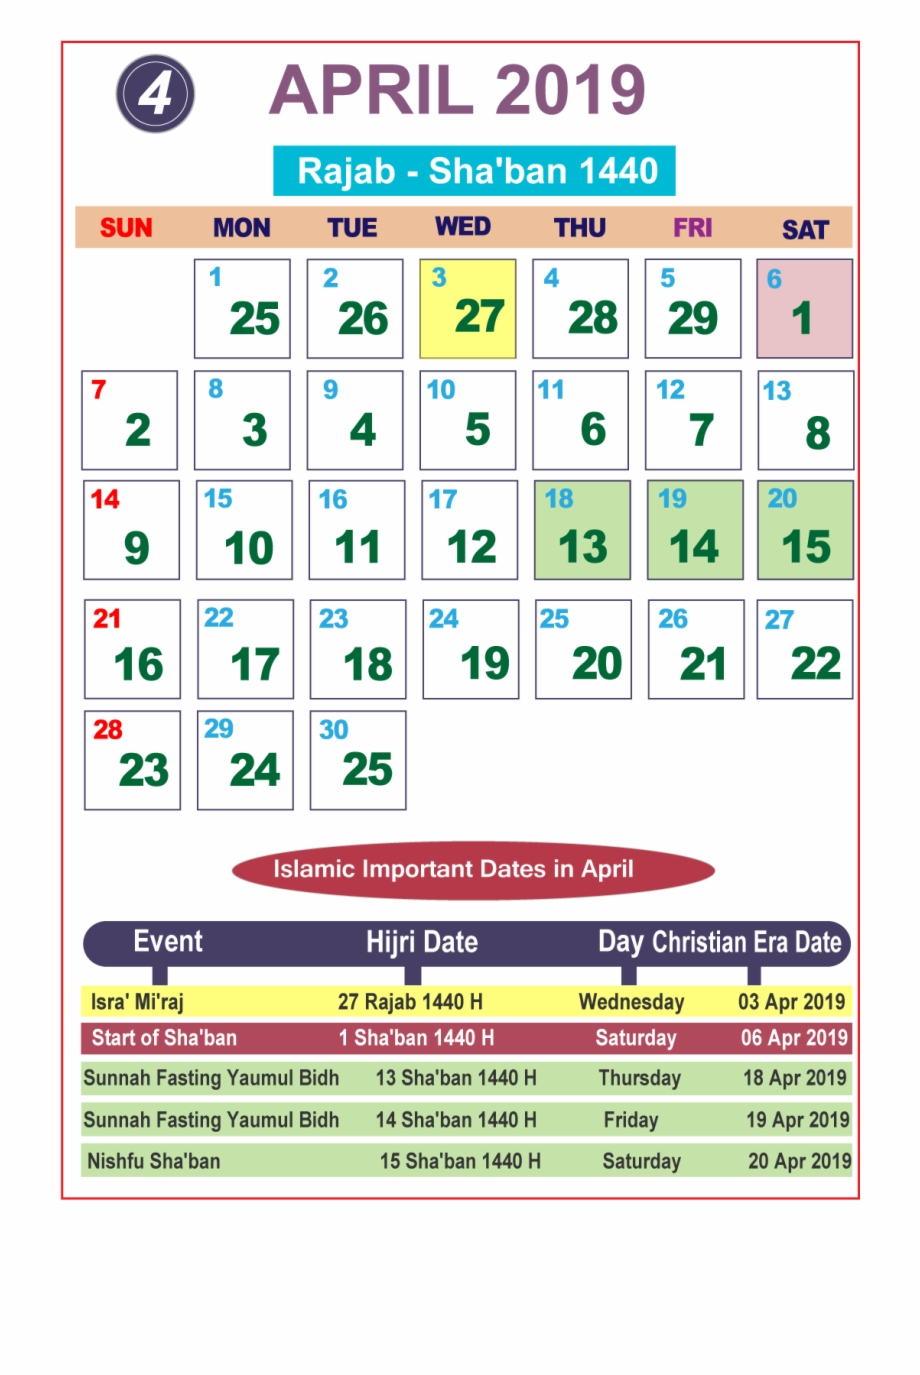 Islamic Calendar 2019 June  Google Search intended for Wincalendar April 2020